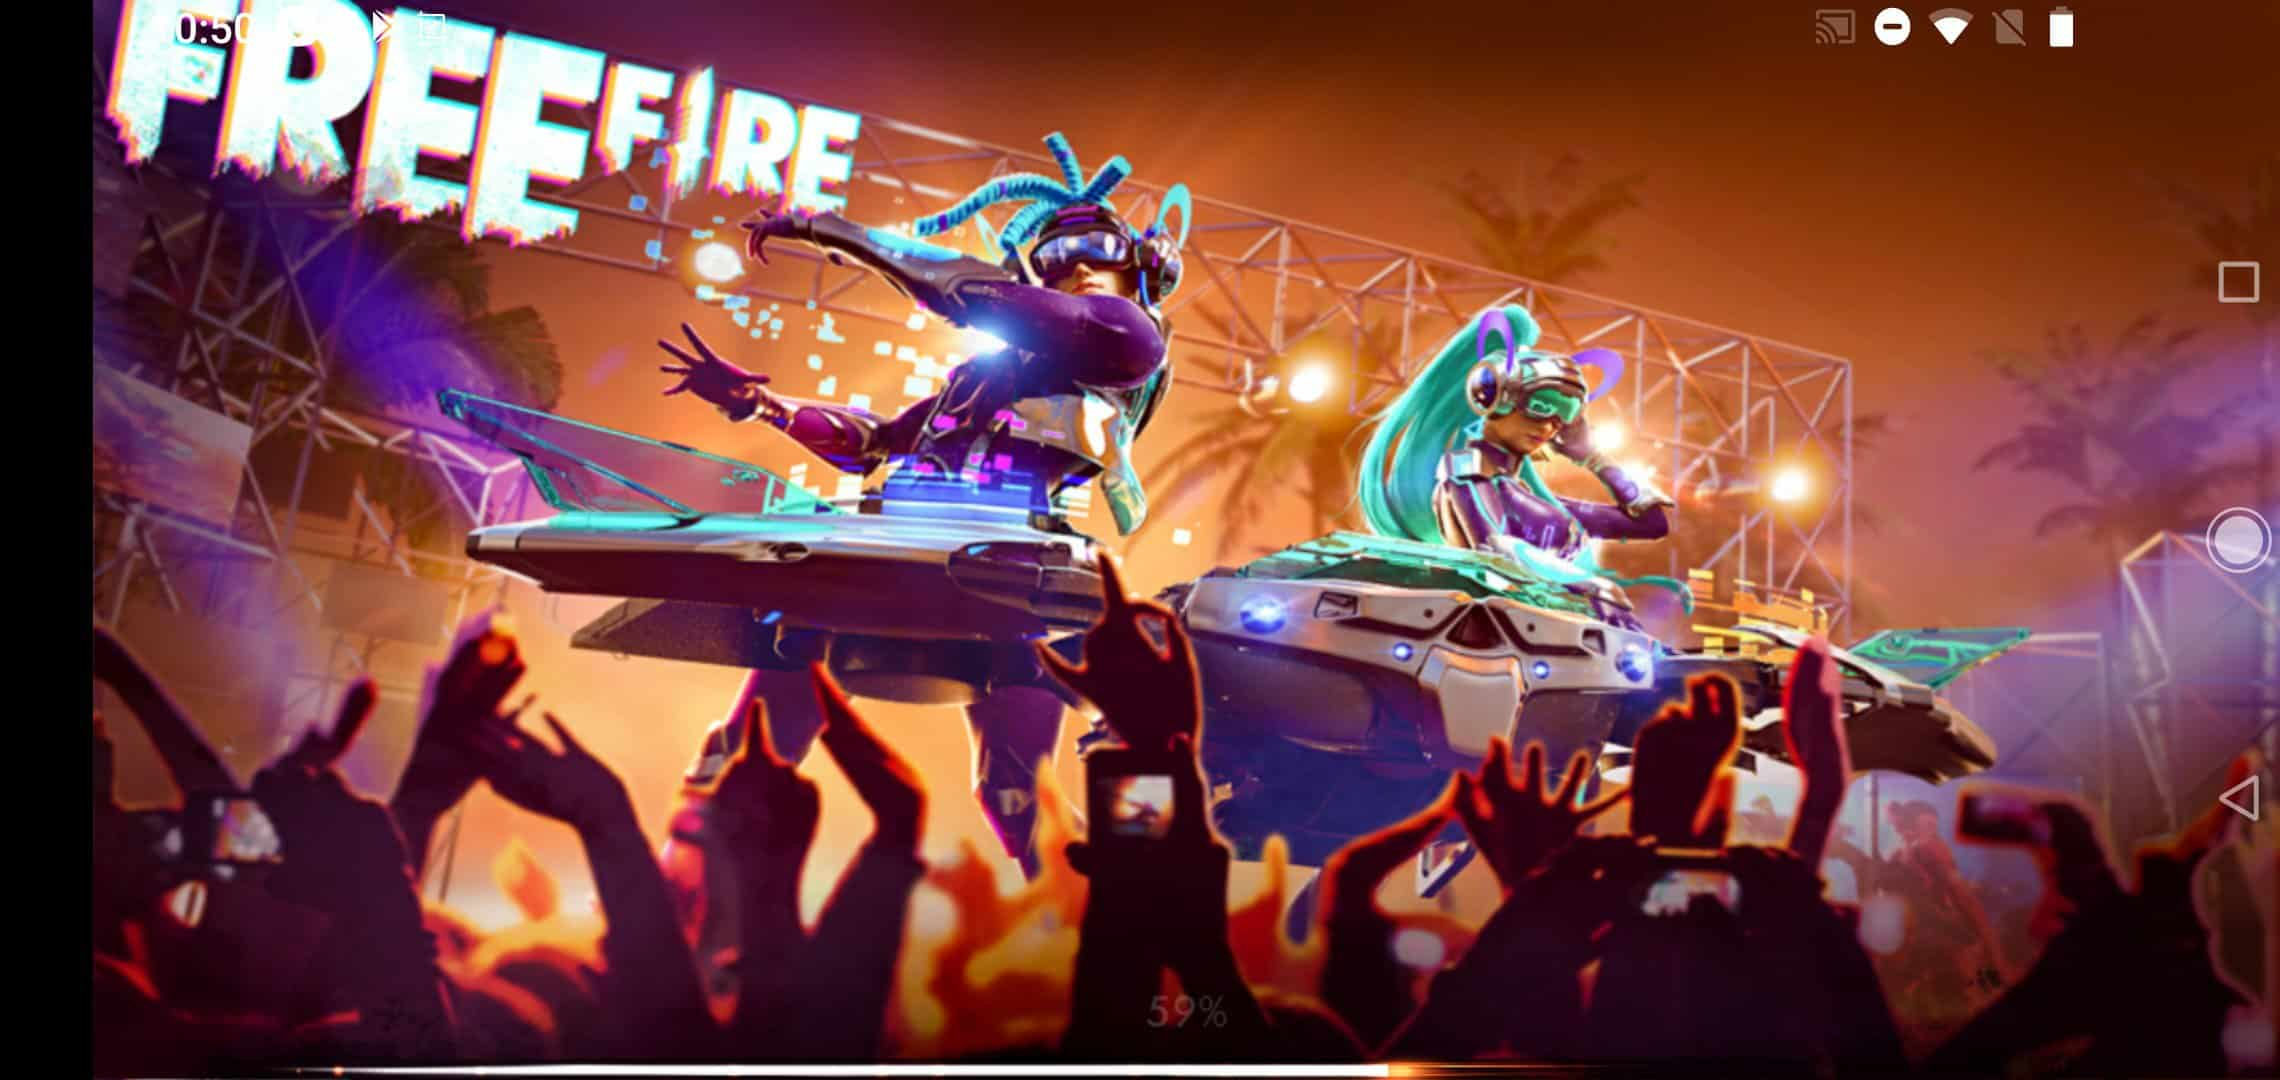 Tujuan-Advance-Server-di-Game-Free-Fire